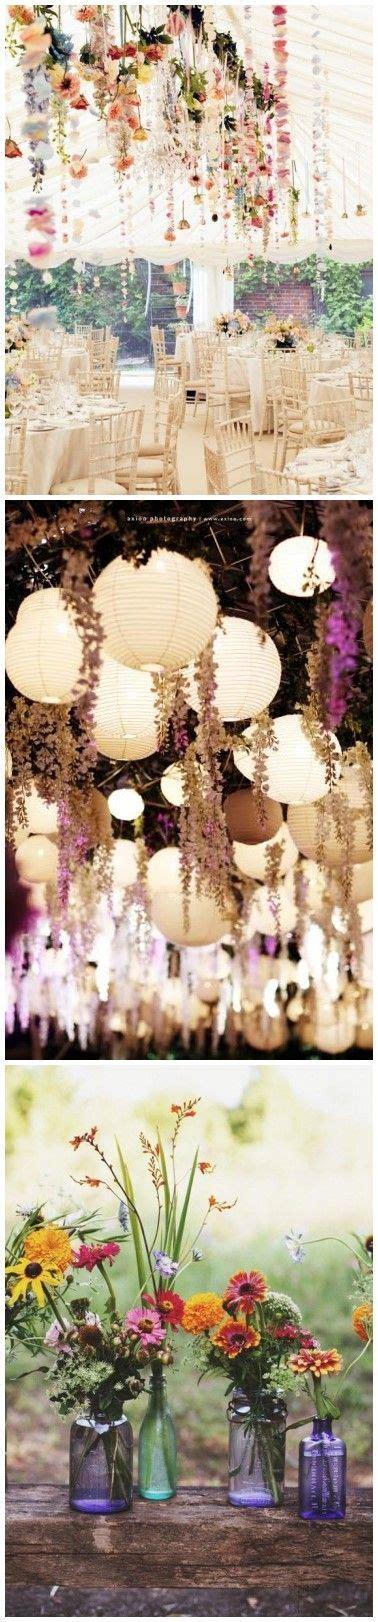 best 25 ceiling decor ideas on pinterest party ceiling